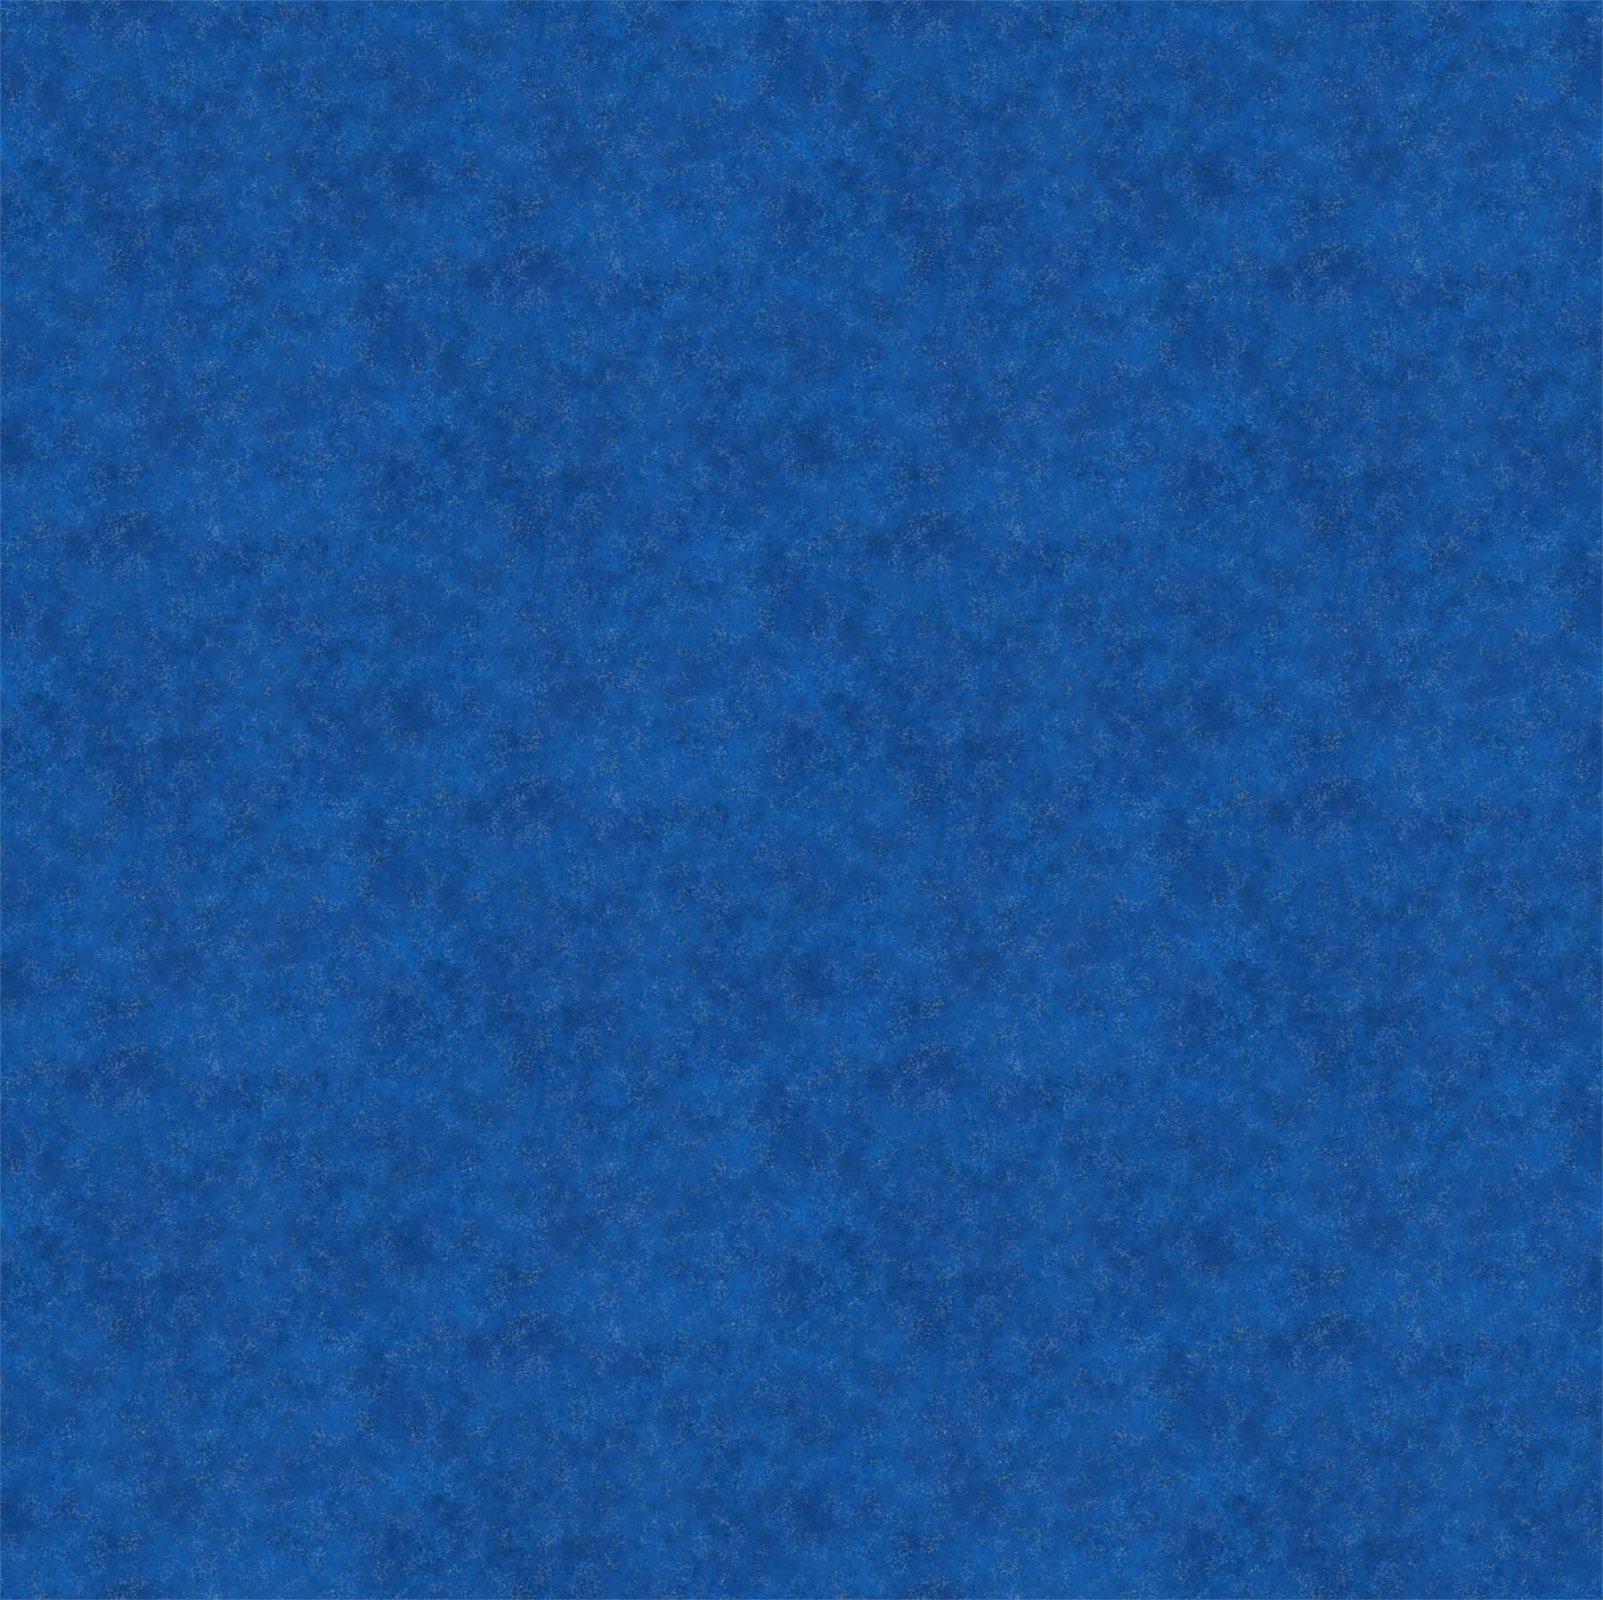 Shimmer - Radiance - Sapphire